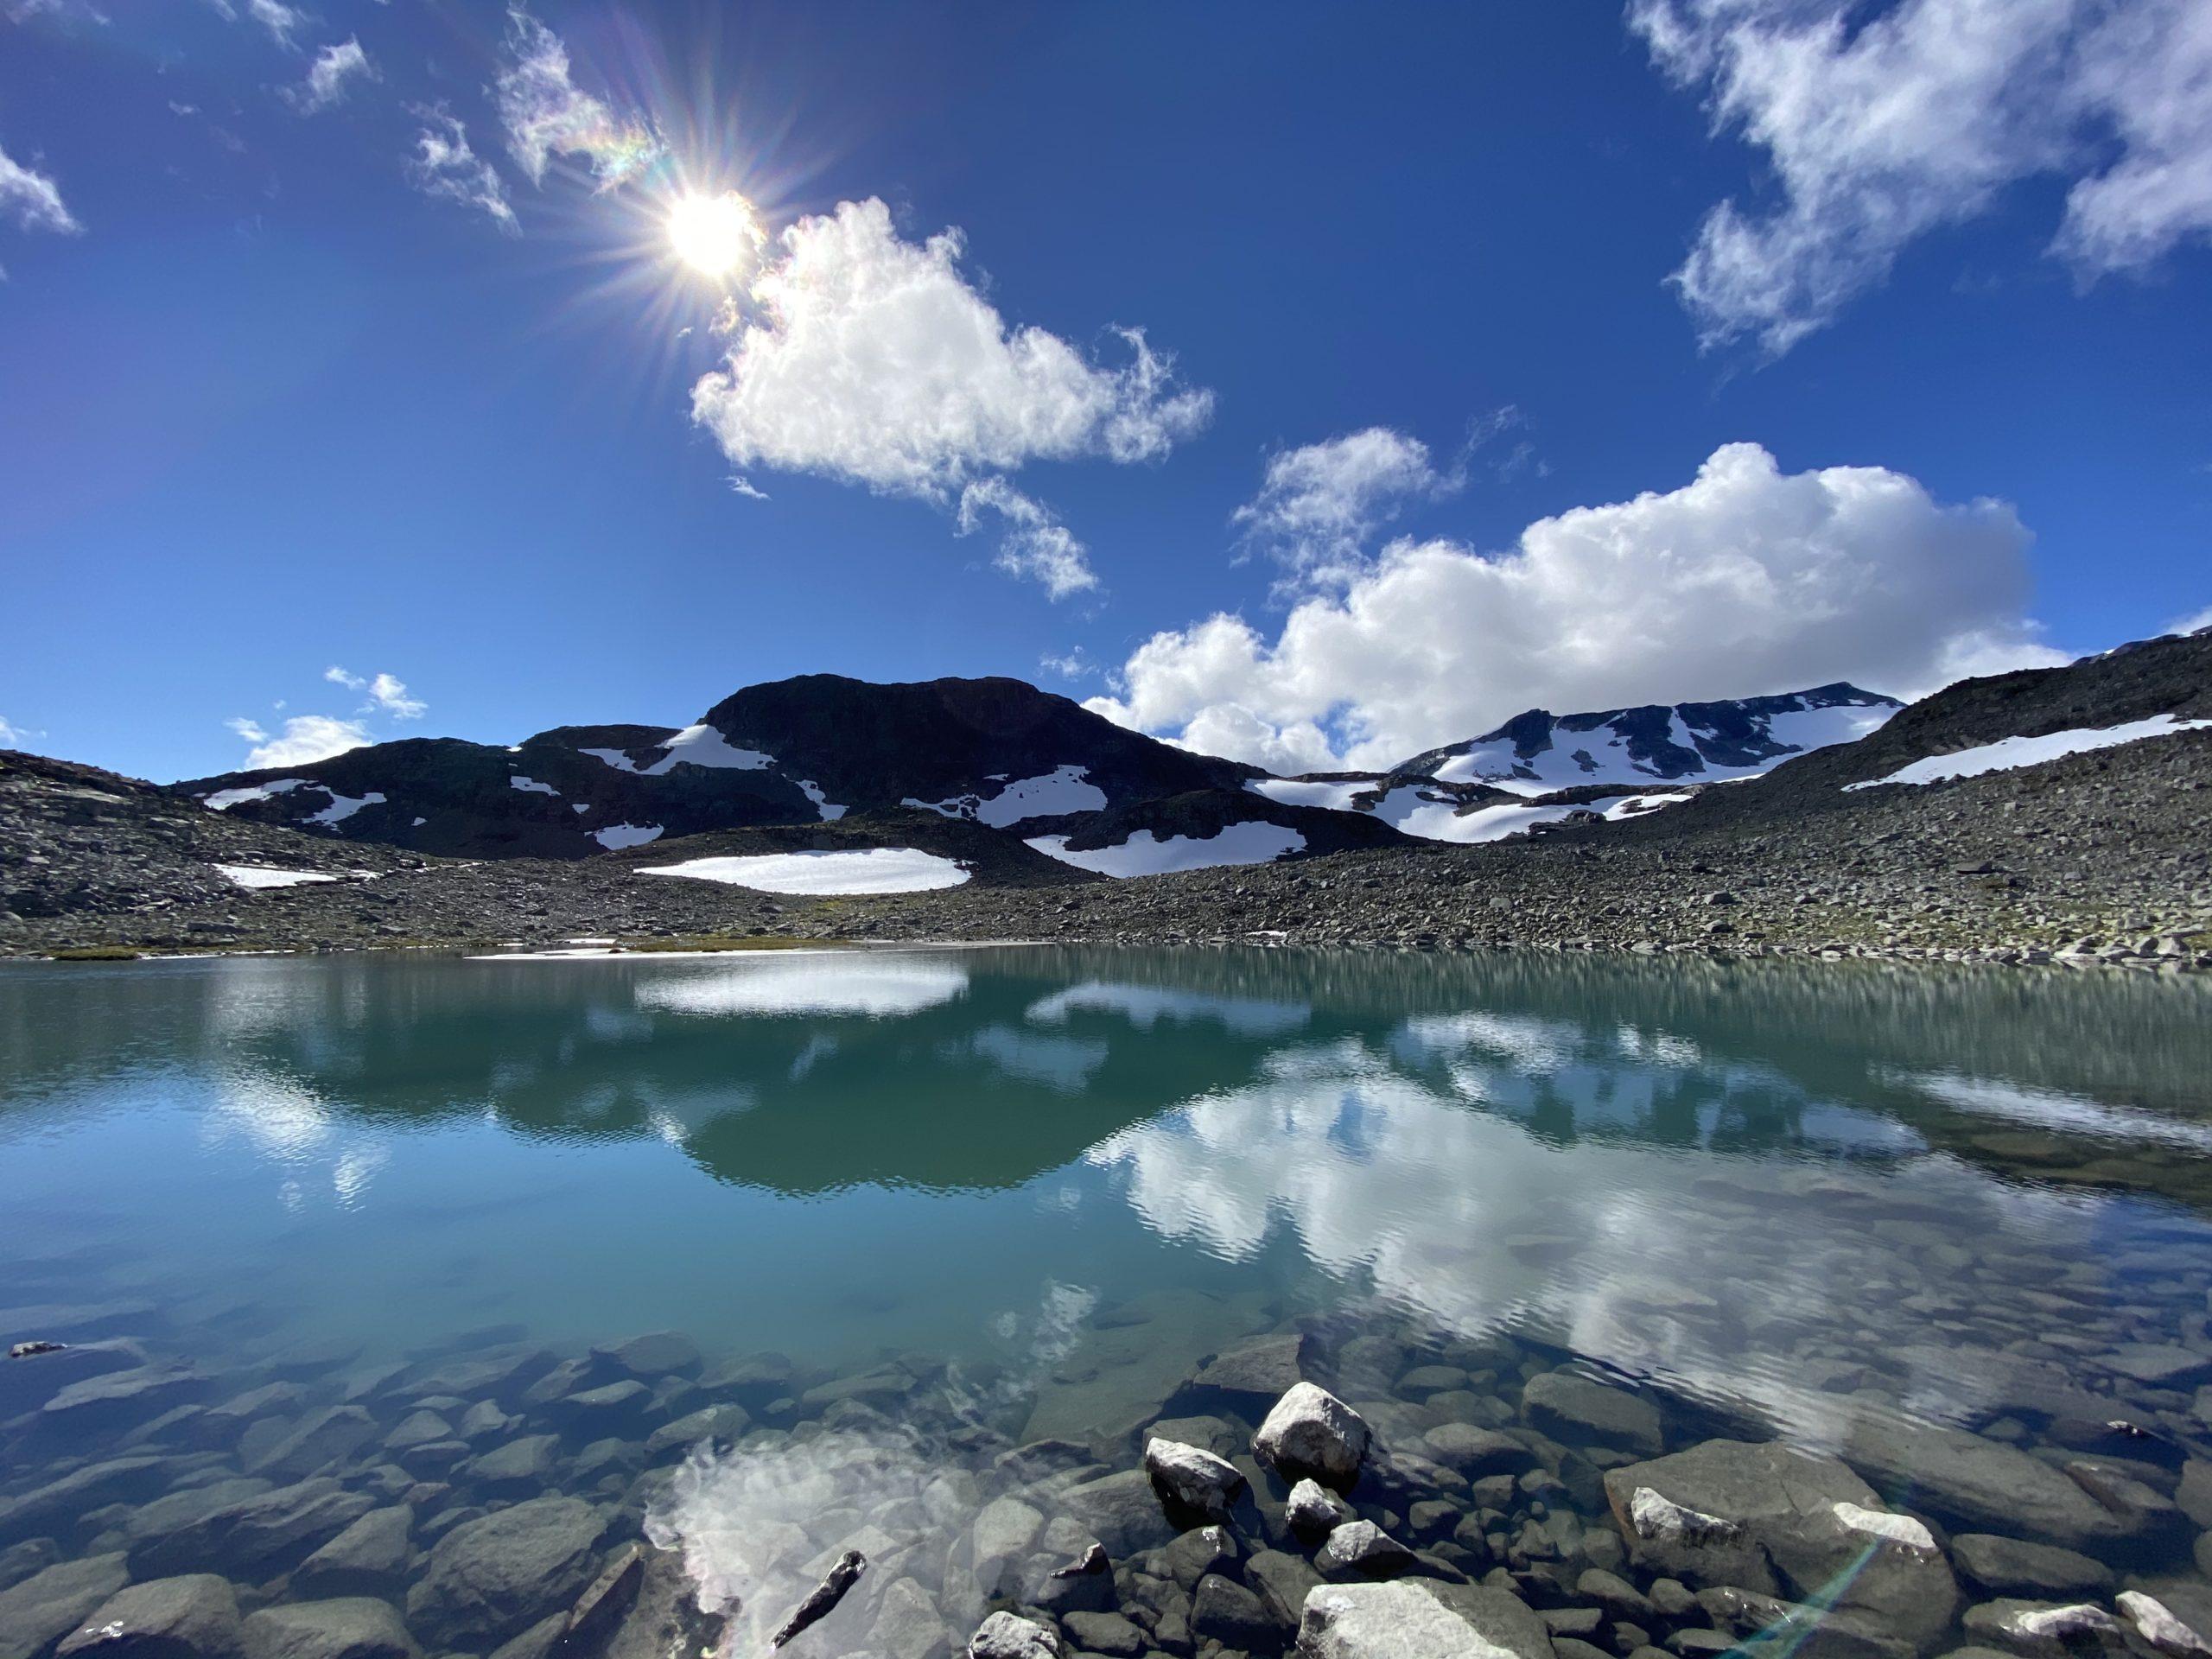 Overnattingstur til Fanaråken 2068 moh